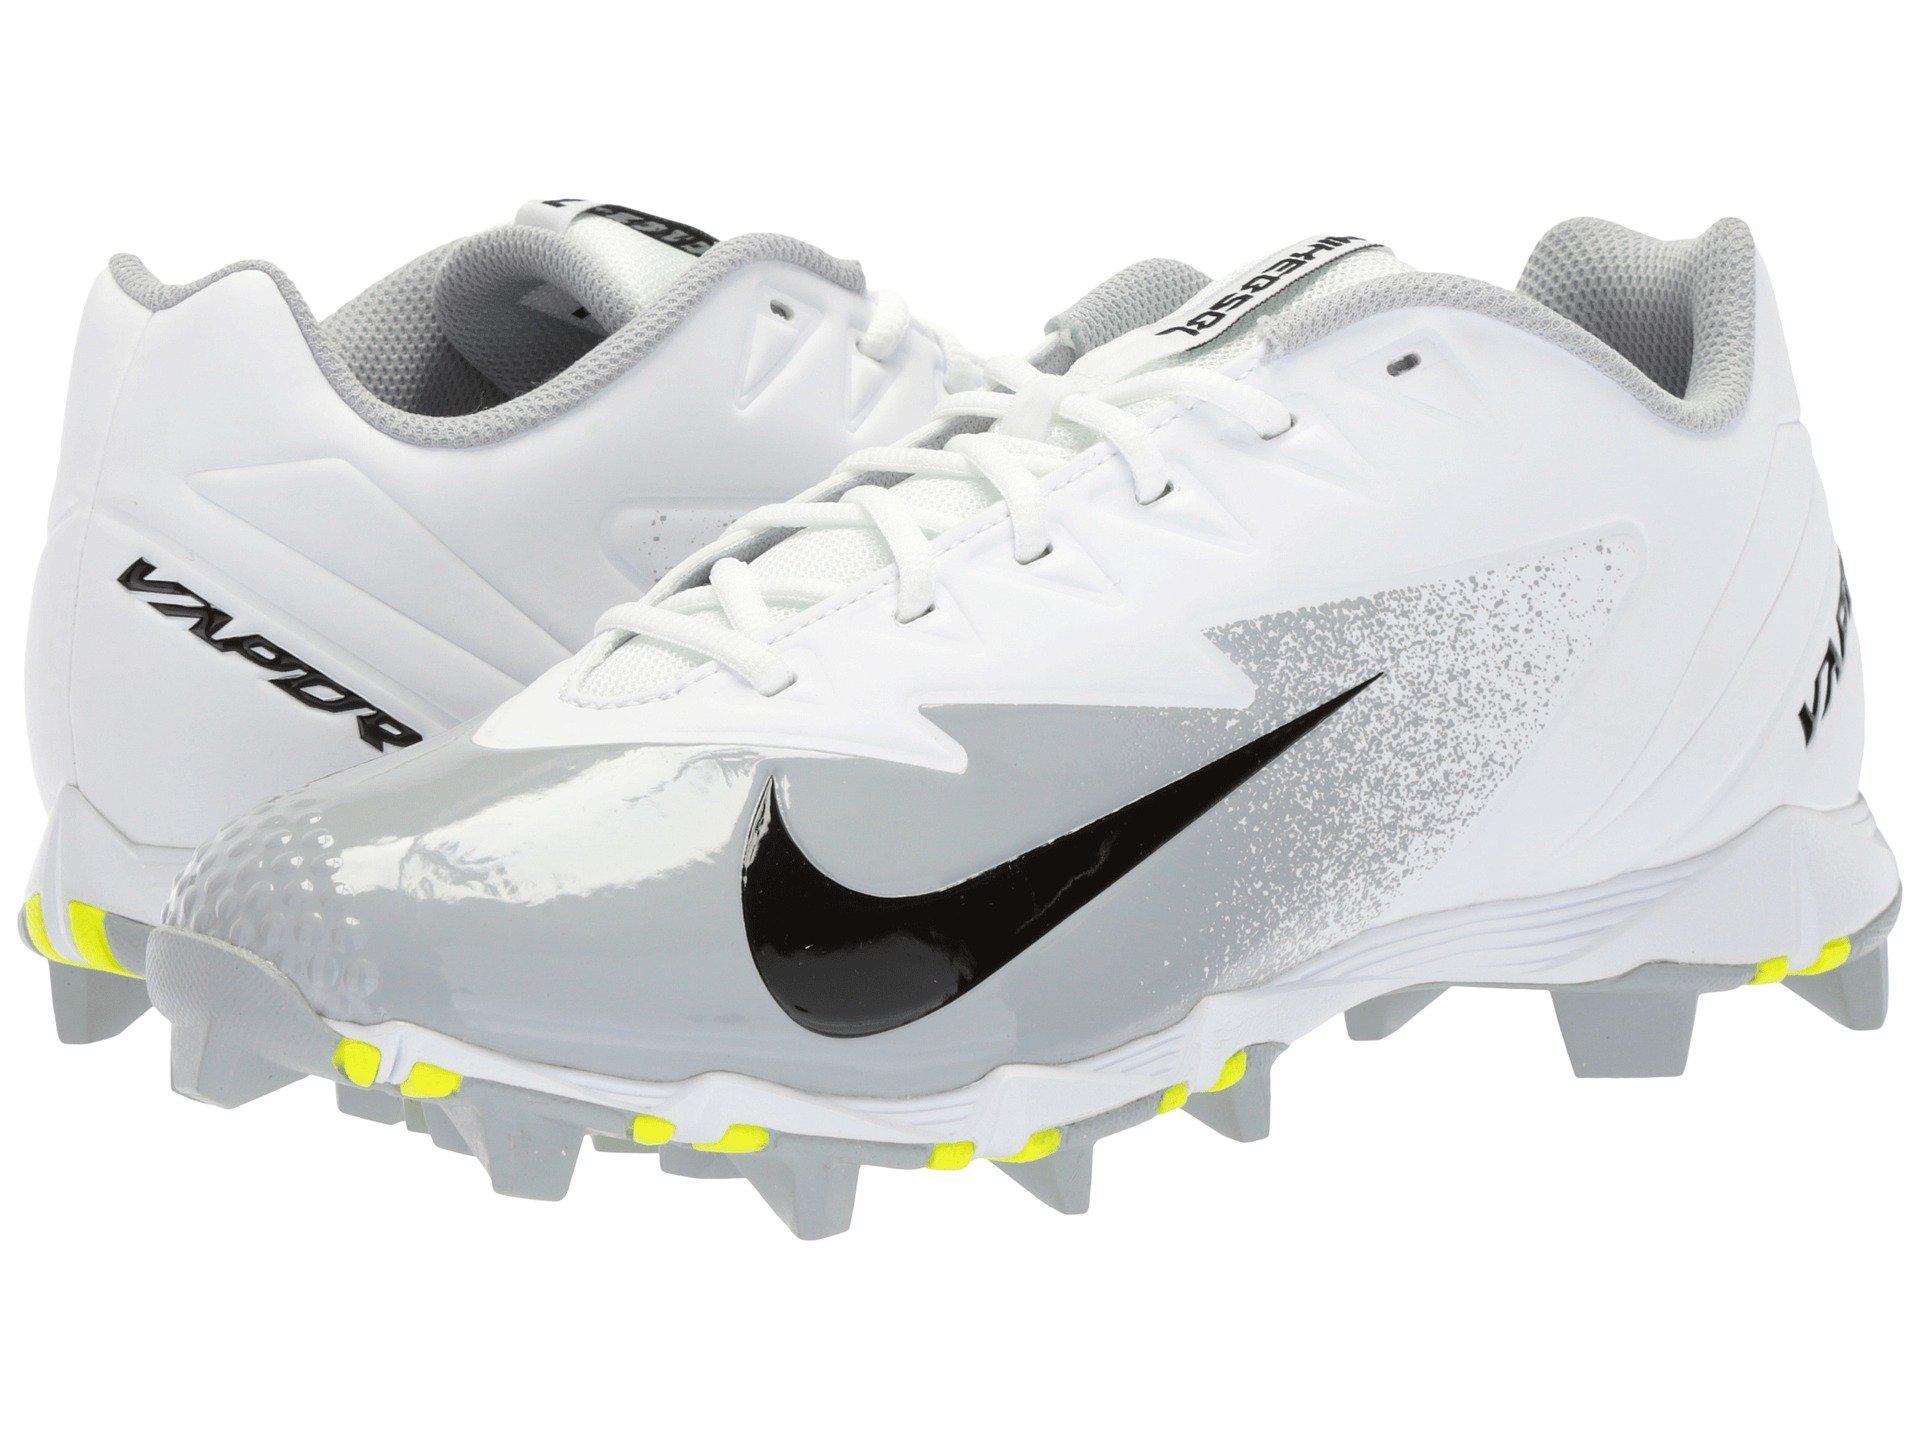 2520e16ca7a1 Lyst - Nike Vapor Ultrafly Keystone in White for Men - Save 17%